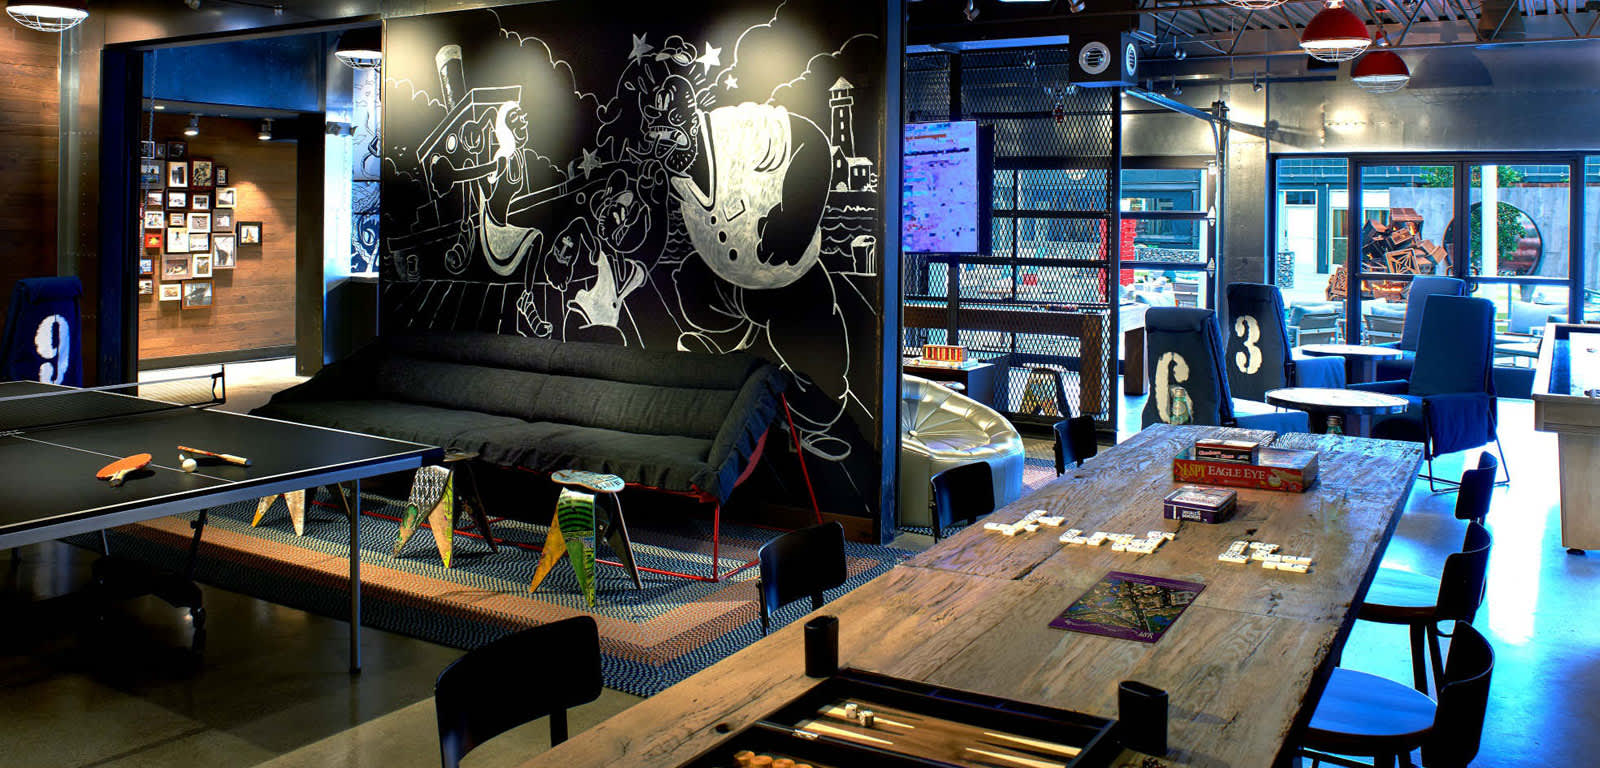 Interior Shot of Game Room